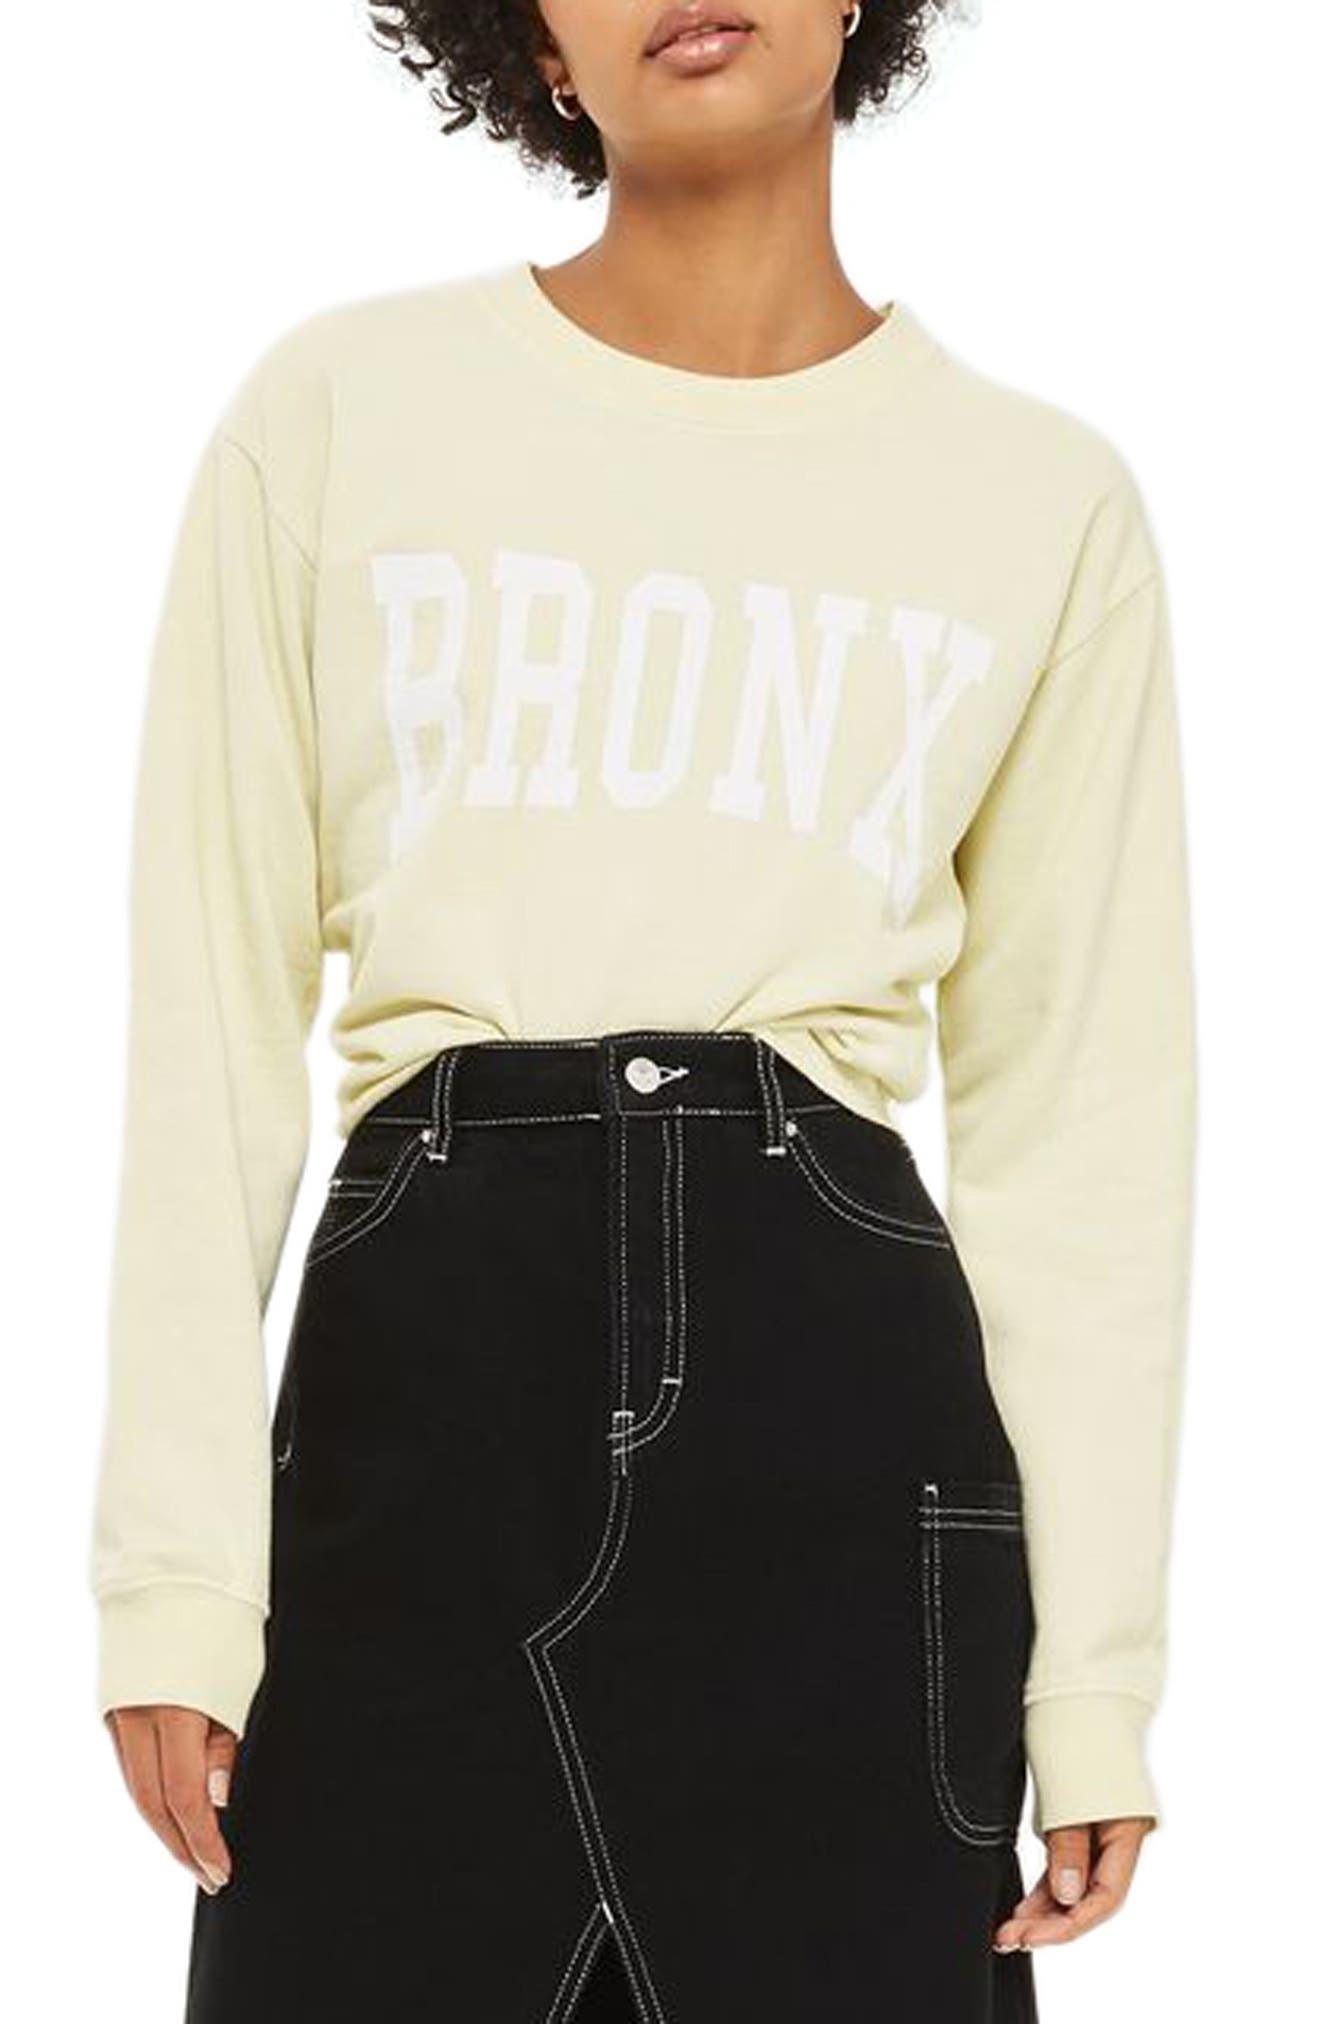 Alternate Image 1 Selected - Topshop Bronx Cropped Sweatshirt